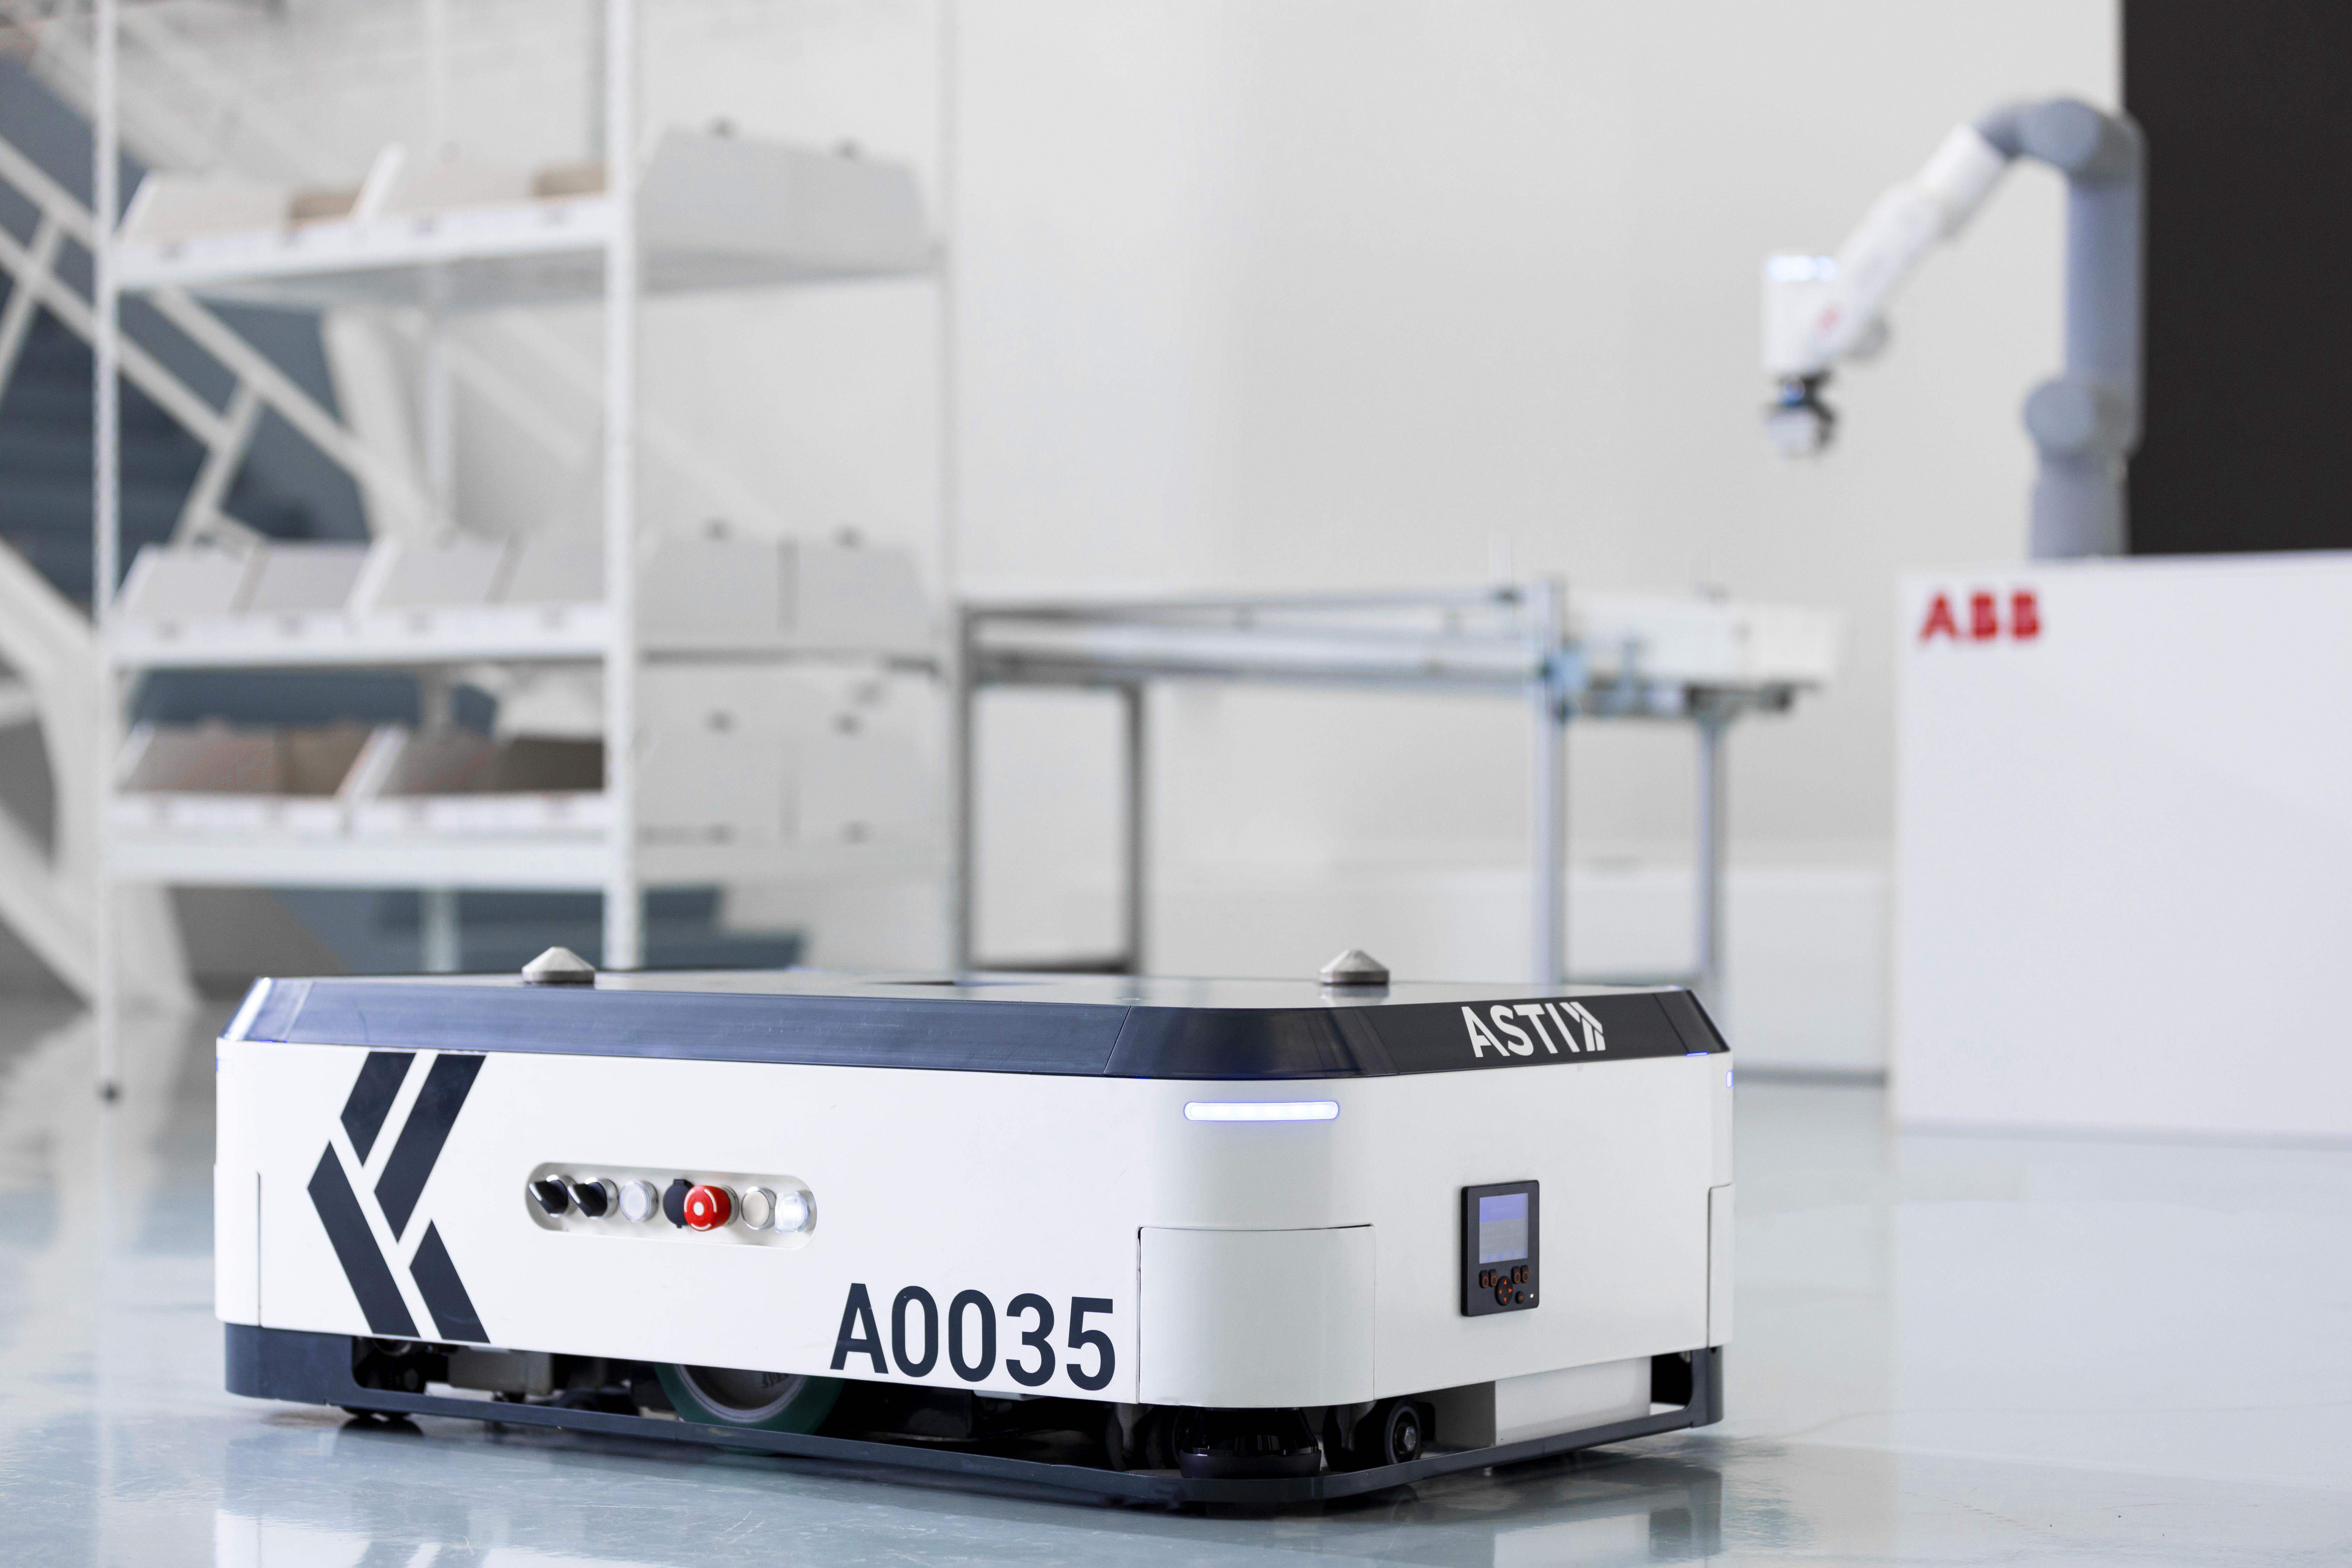 asti-ABB_Robotics_acquires_ASTI_Mobile_Robotics_Goods-to-person_GoFa_cobot_ASTI_EBOT_350.jpg